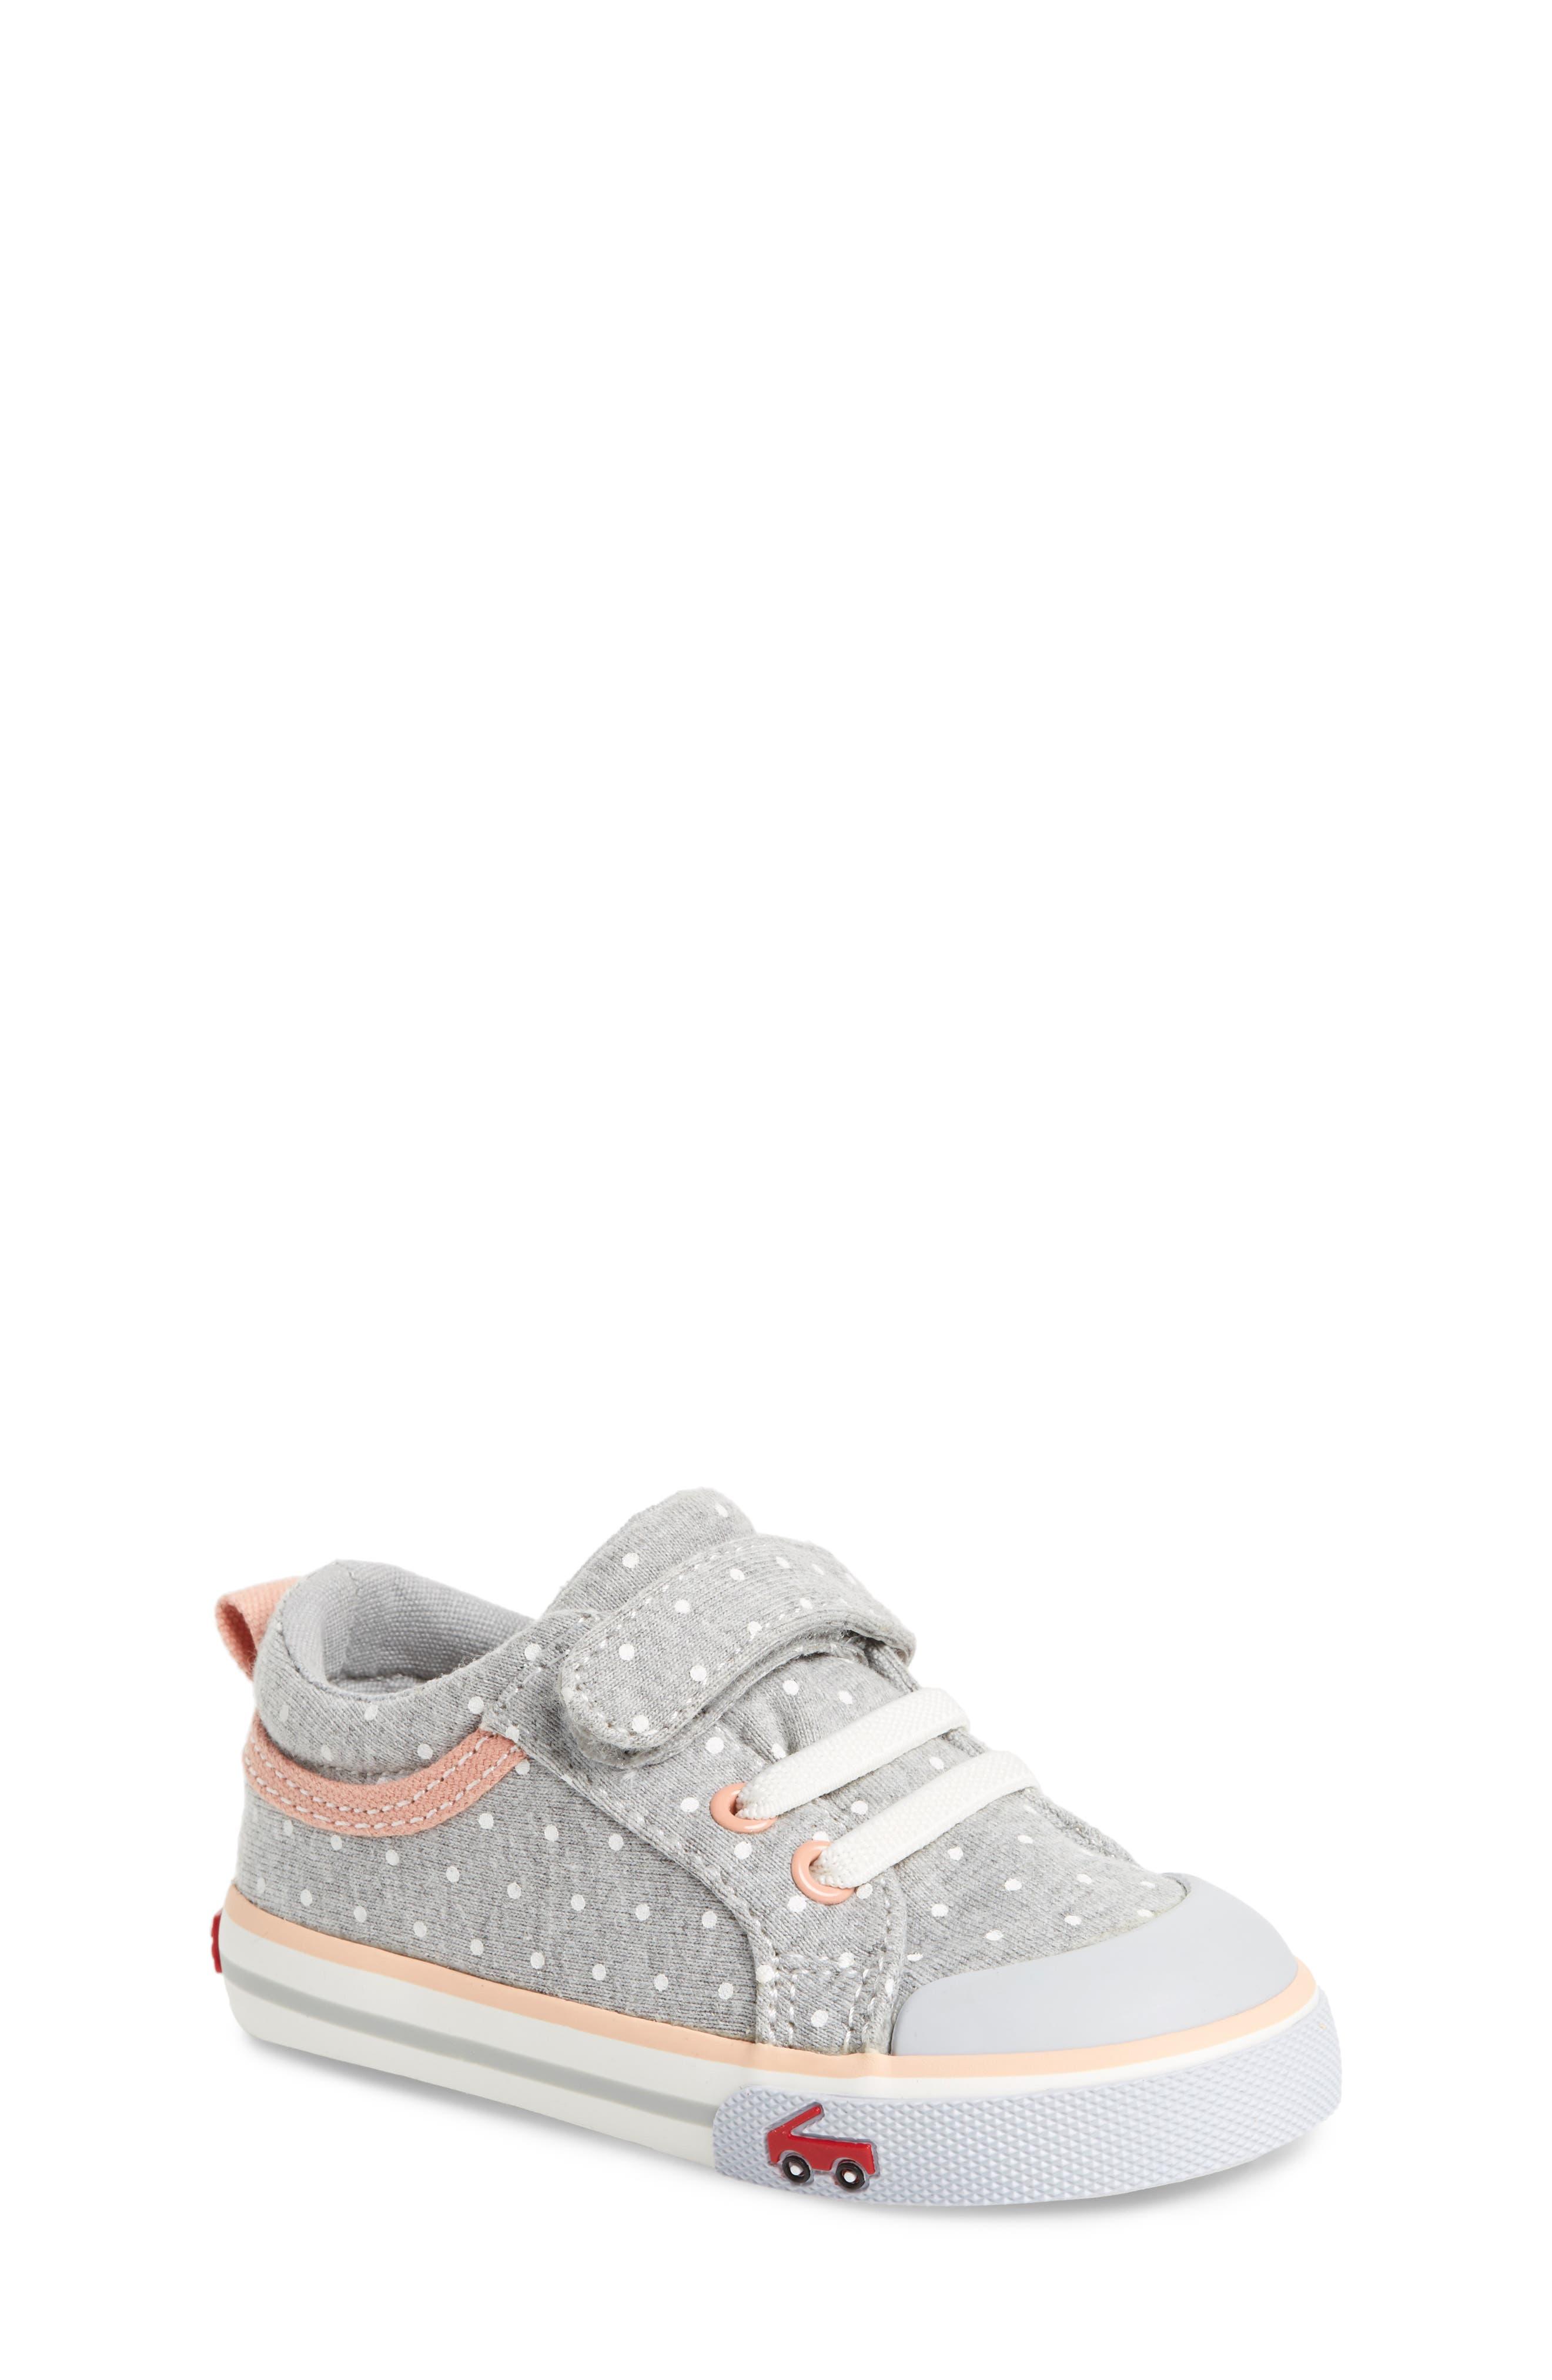 Kristin Sneaker,                         Main,                         color, 023